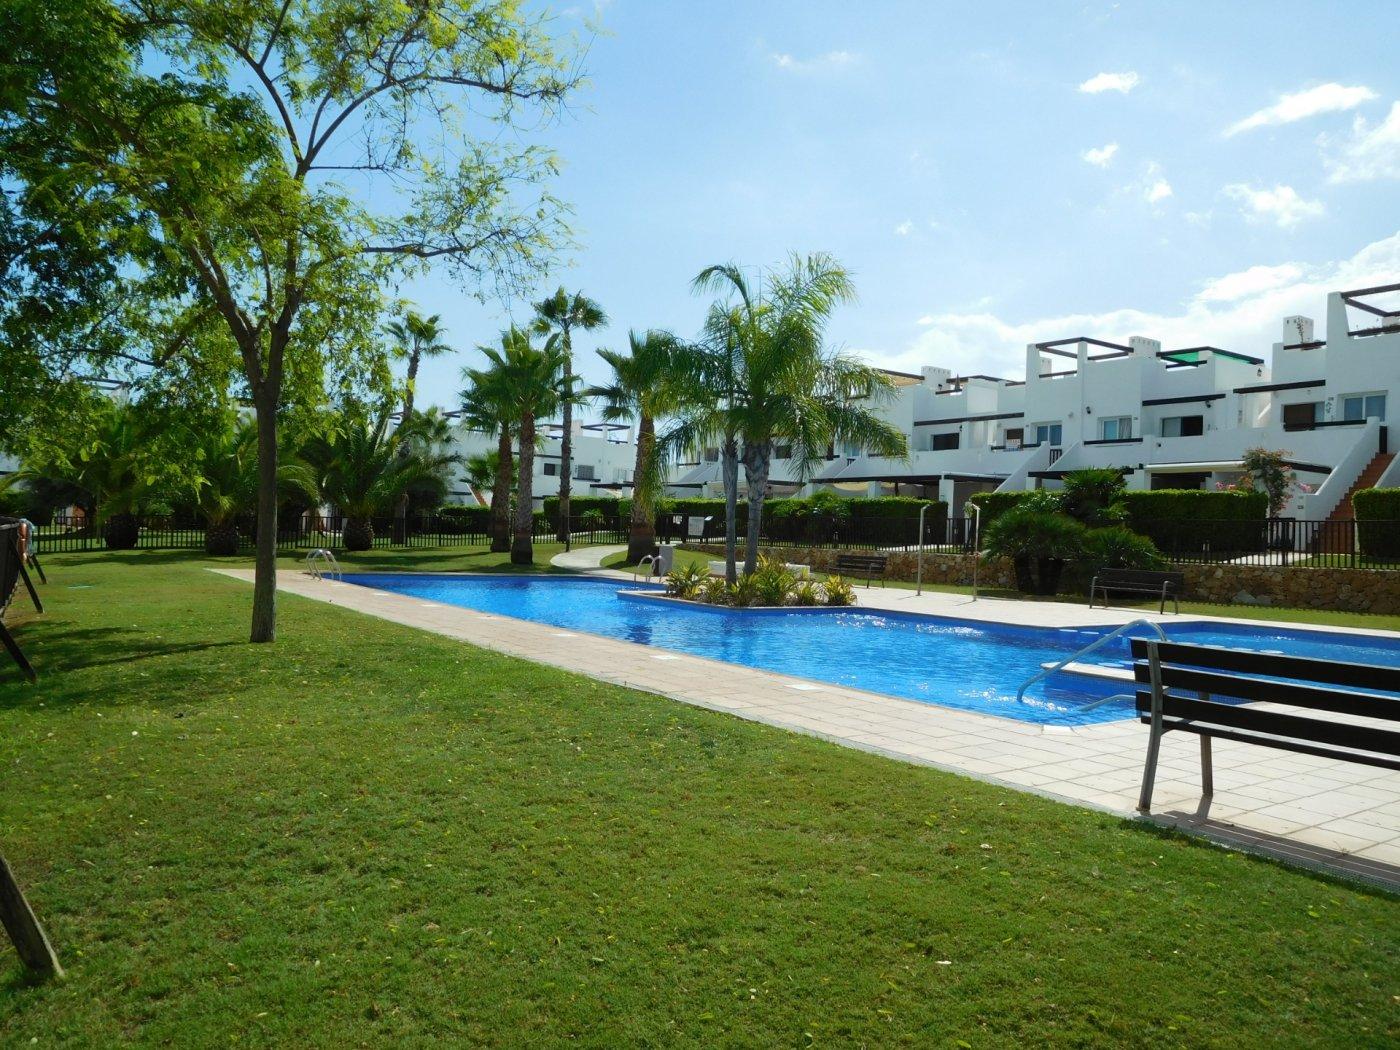 Gallery Image 30 of Apartment For rent in Condado De Alhama, Alhama De Murcia With Pool